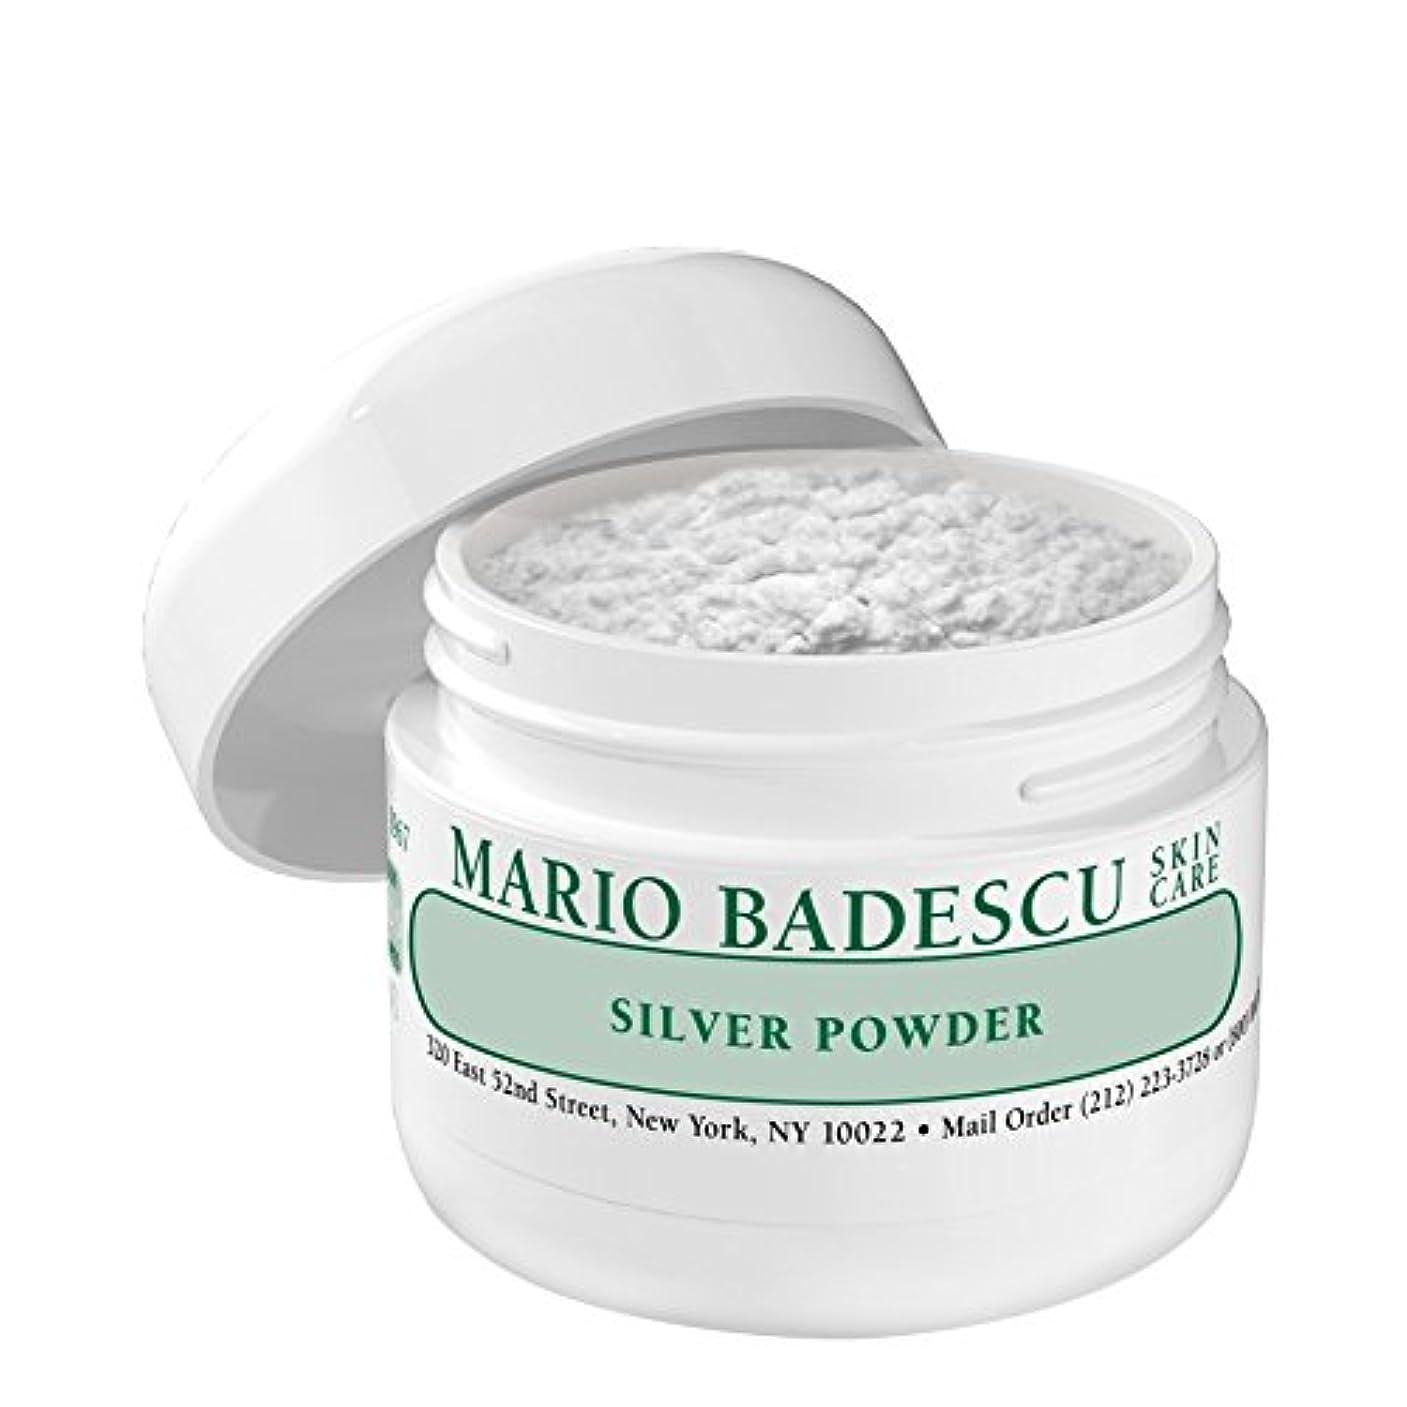 Mario Badescu Silver Powder (Pack of 6) - マリオ?バデスキュー銀粉末 x6 [並行輸入品]